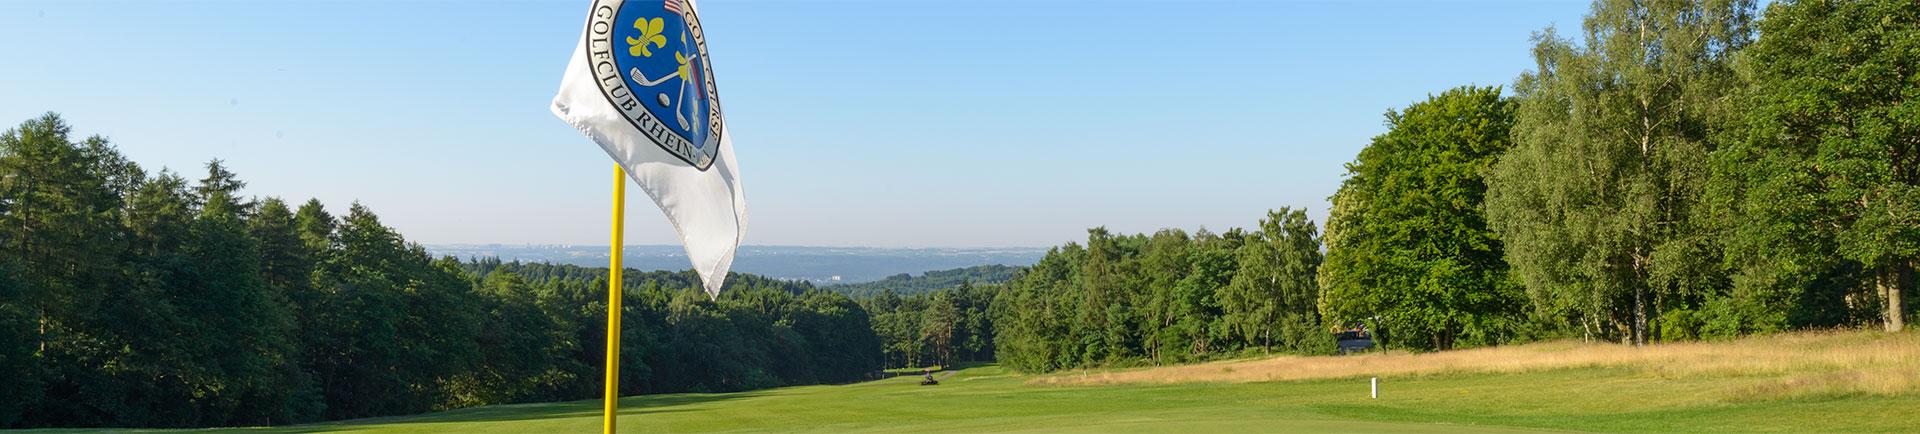 rheinblick-golfcourse-23